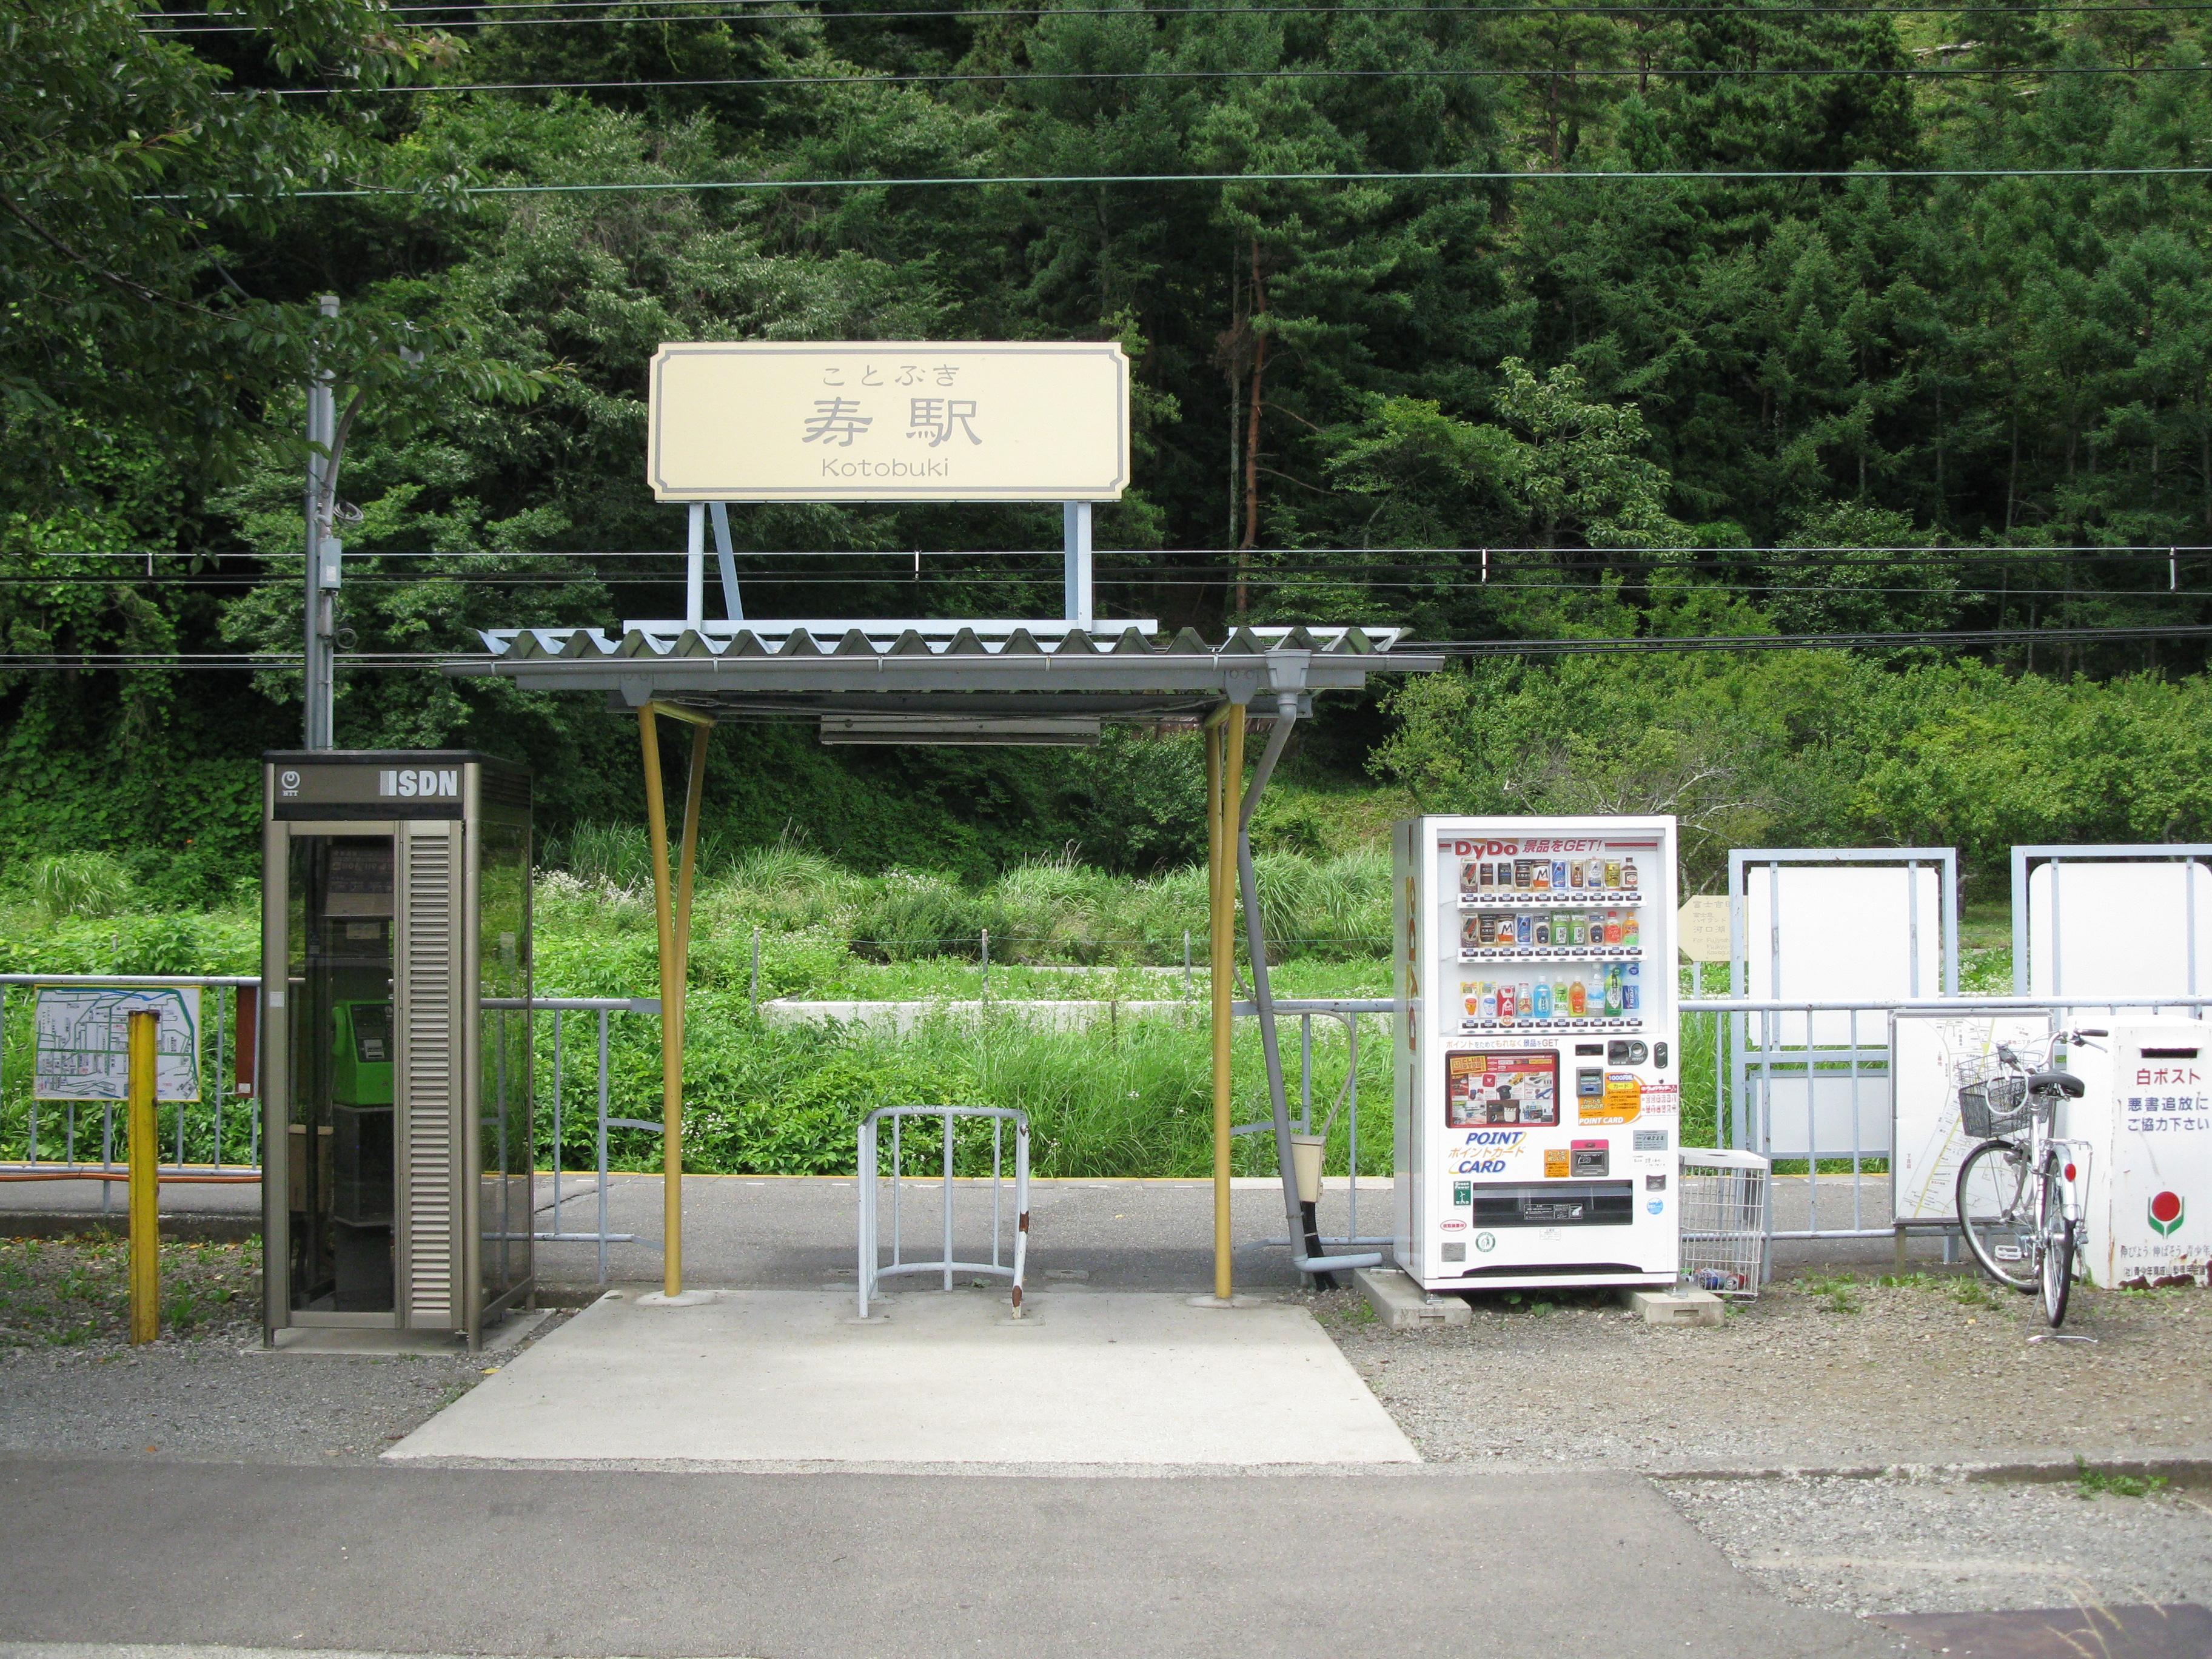 https://upload.wikimedia.org/wikipedia/commons/f/f2/Fuji-kyuko-Kotobuki-station-entrance.jpg